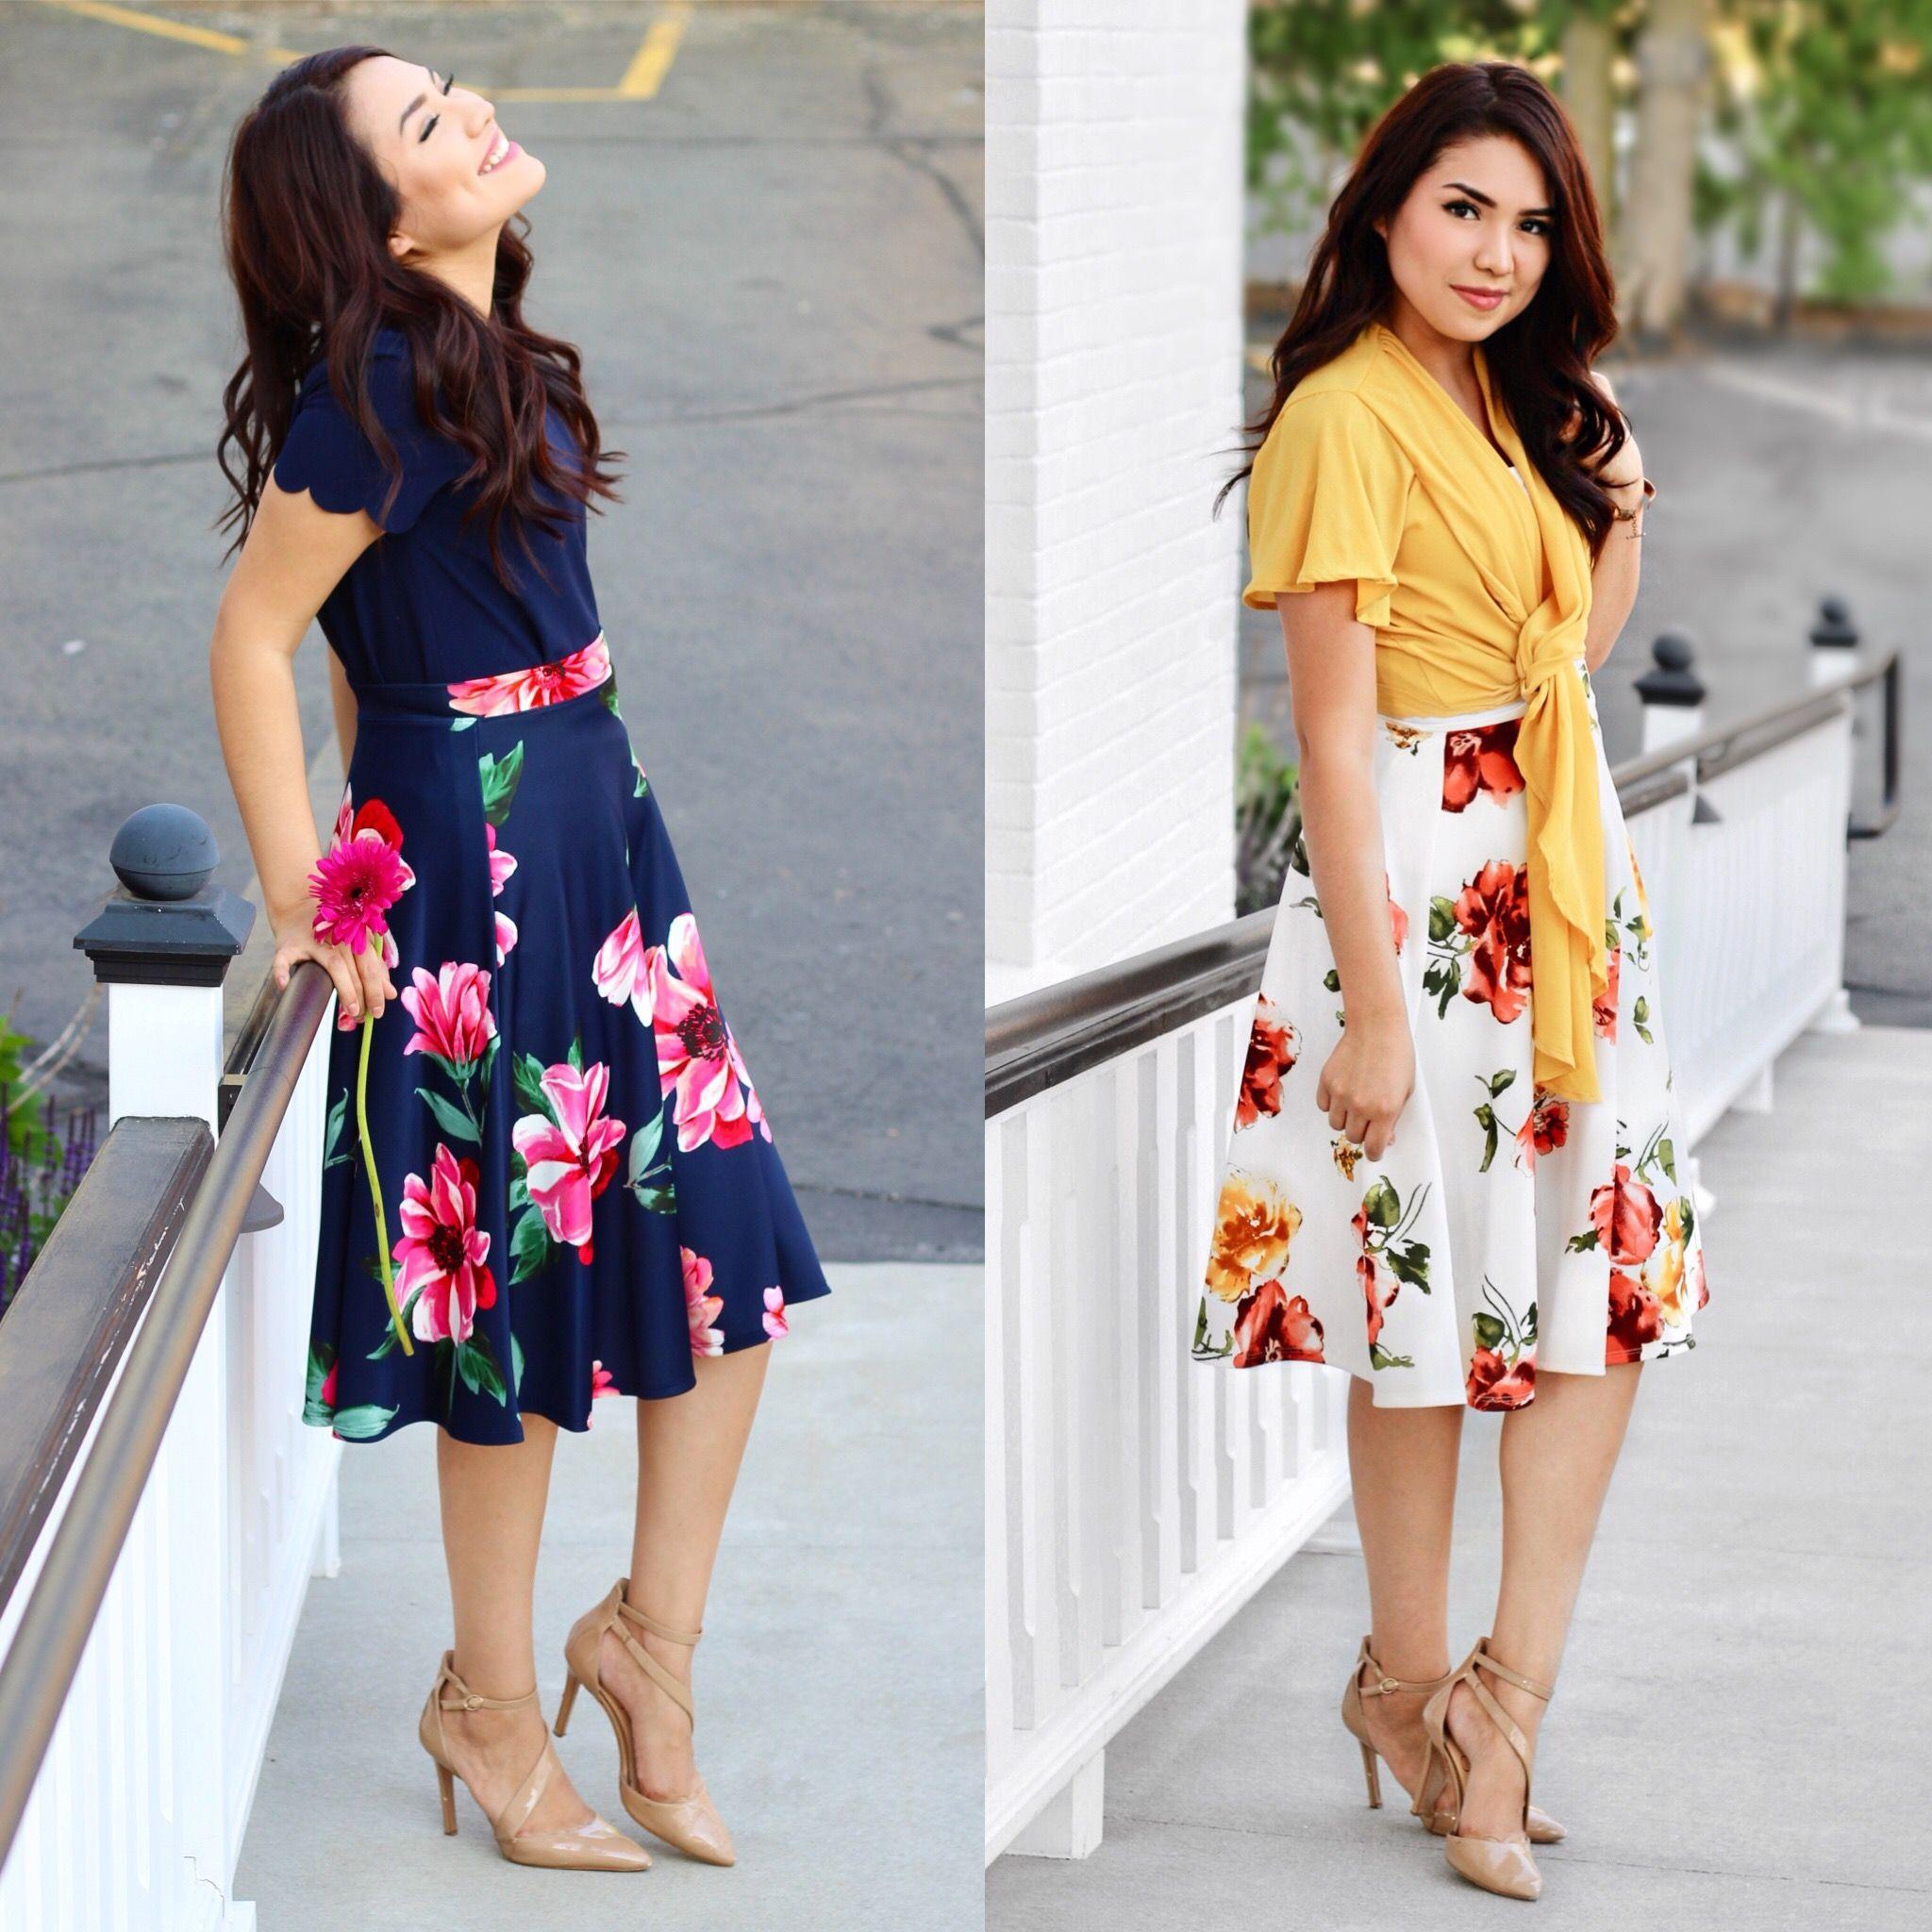 Modest Looks Summer Skirts Summer Look Shopdarlingstyle Fashion Modest Dresses Modest Summer Outfits [ 2048 x 2048 Pixel ]